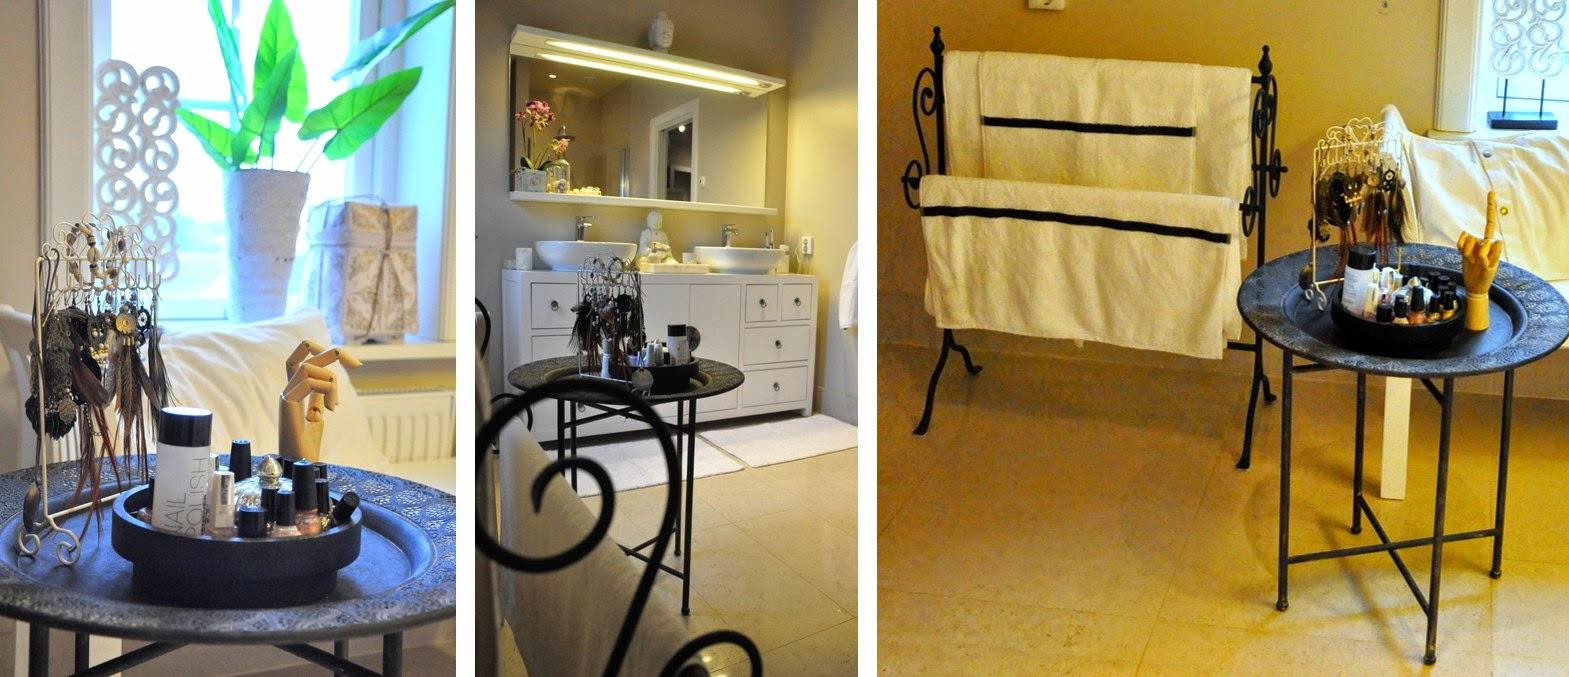 Den vita drömgården: ett vitt badrum i asiatisk stil